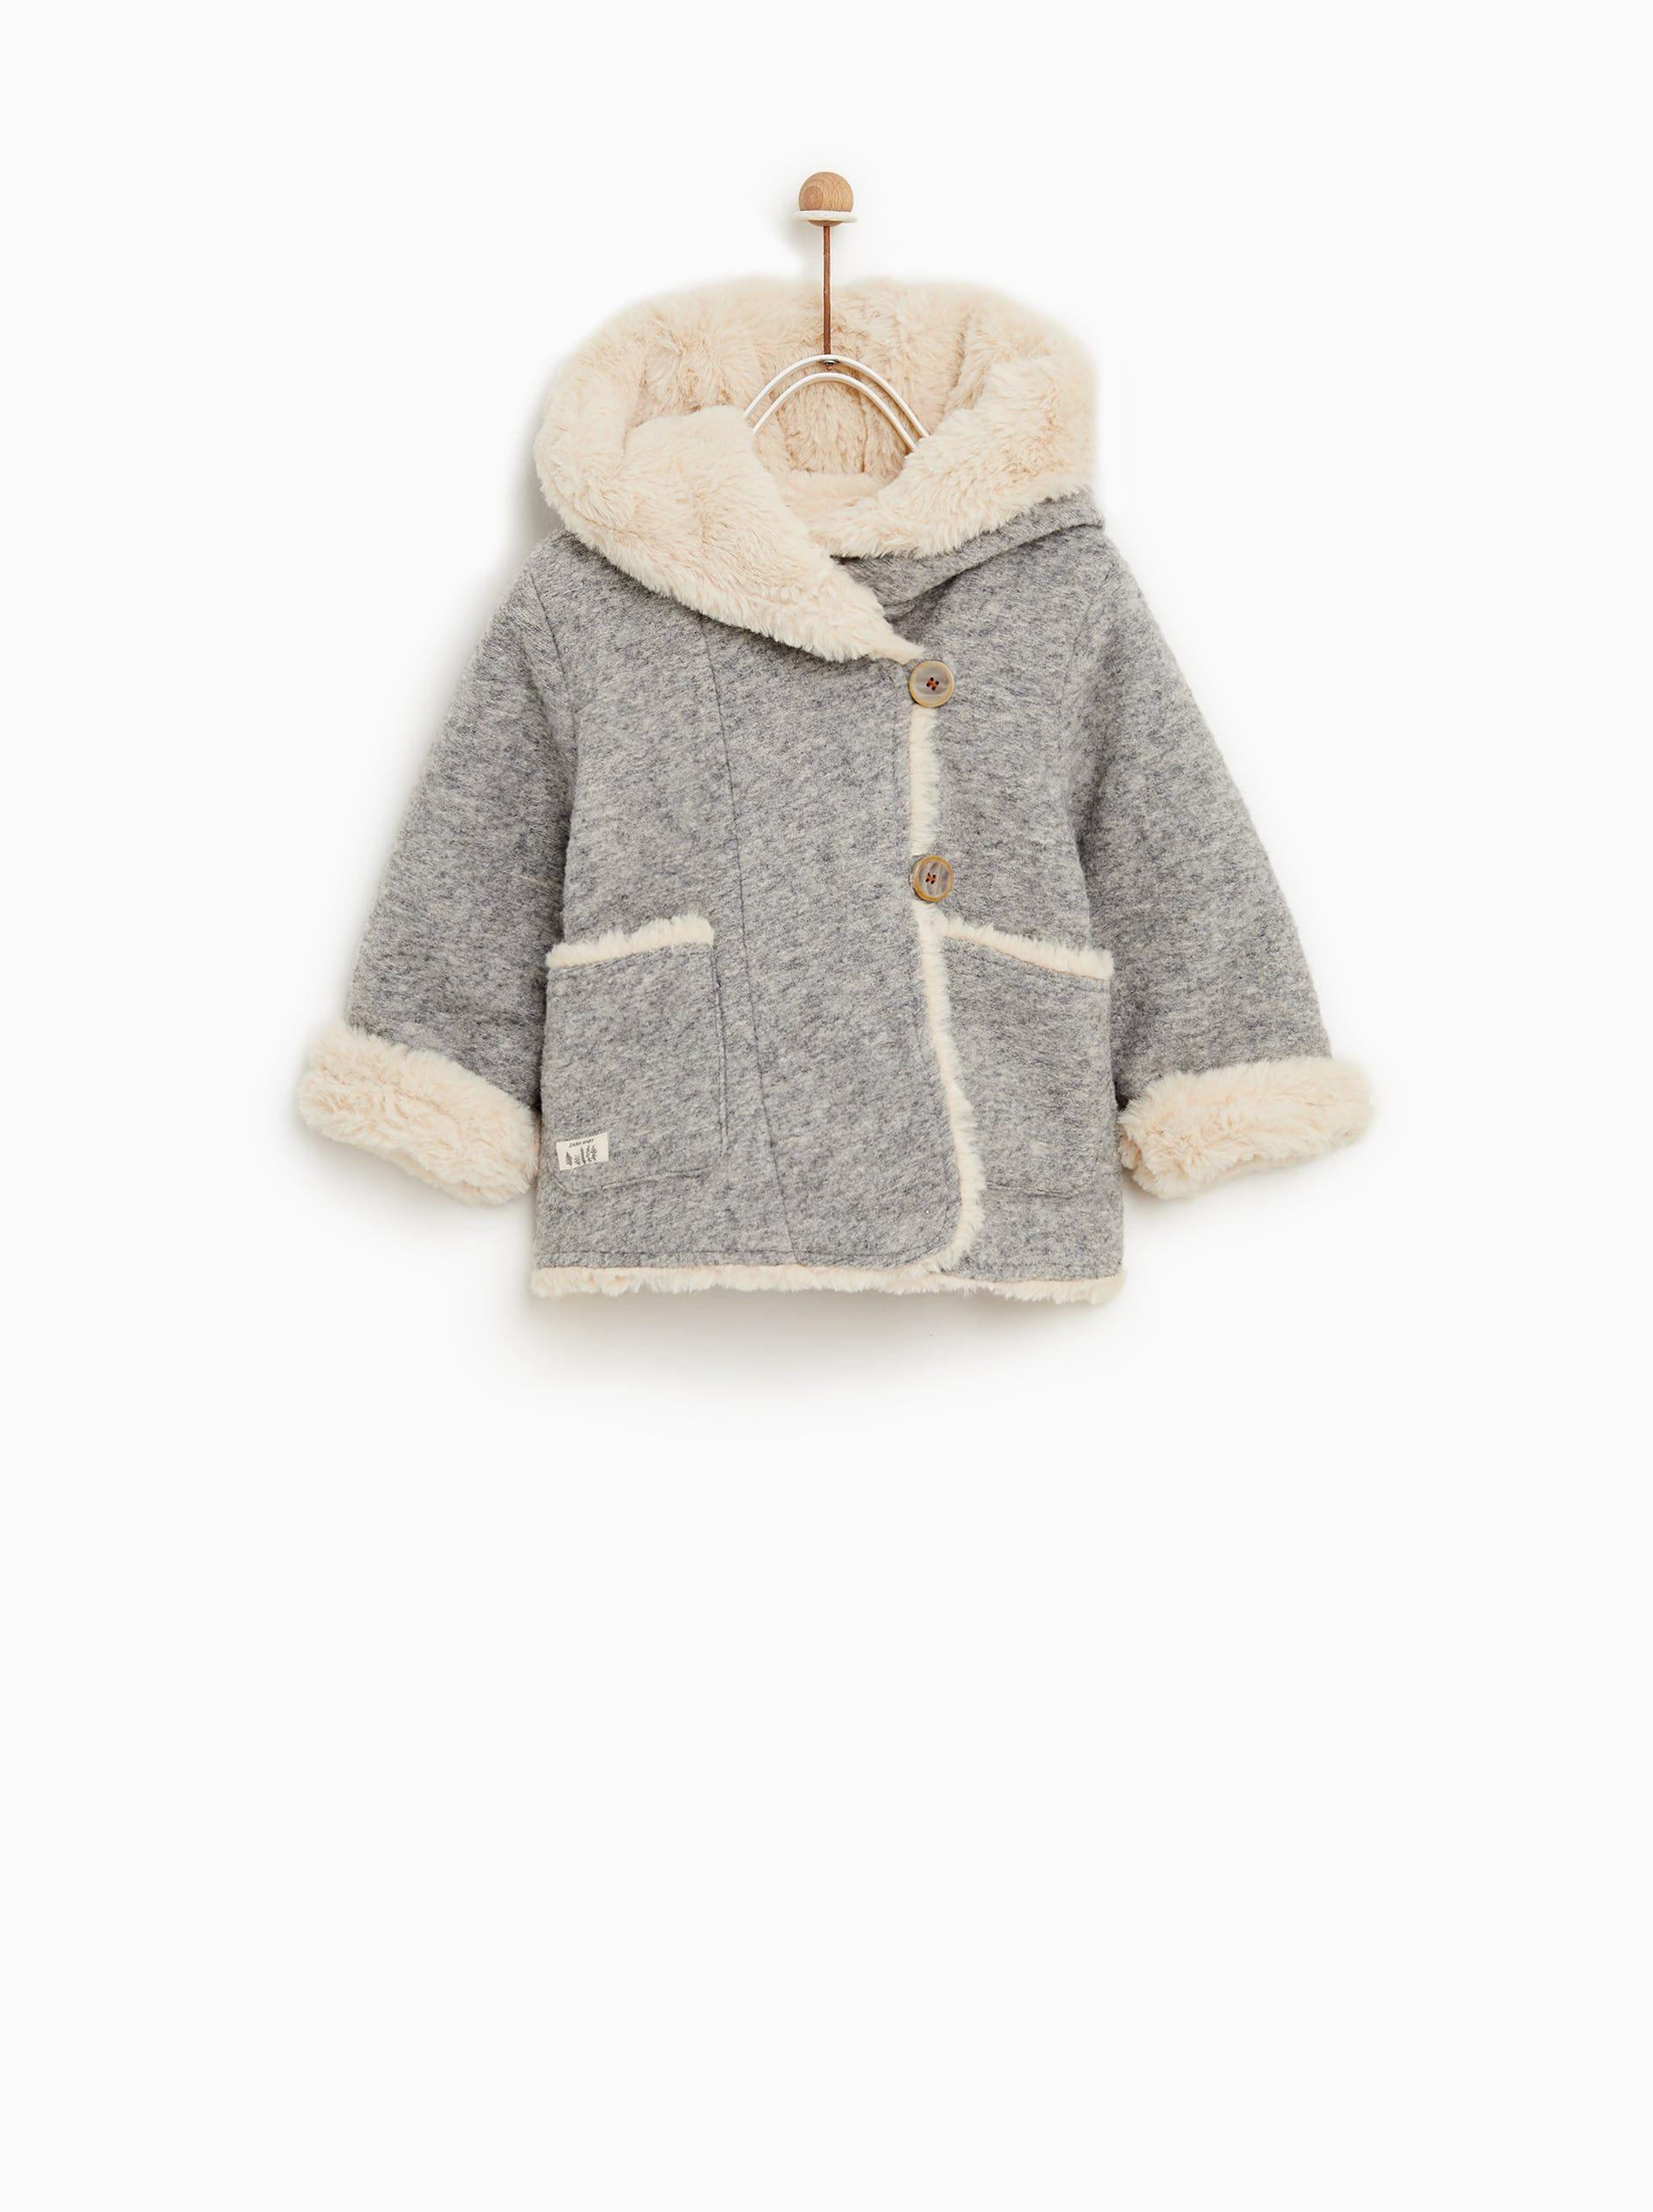 Hooded threequarterlength coat Baby vest, Newborn